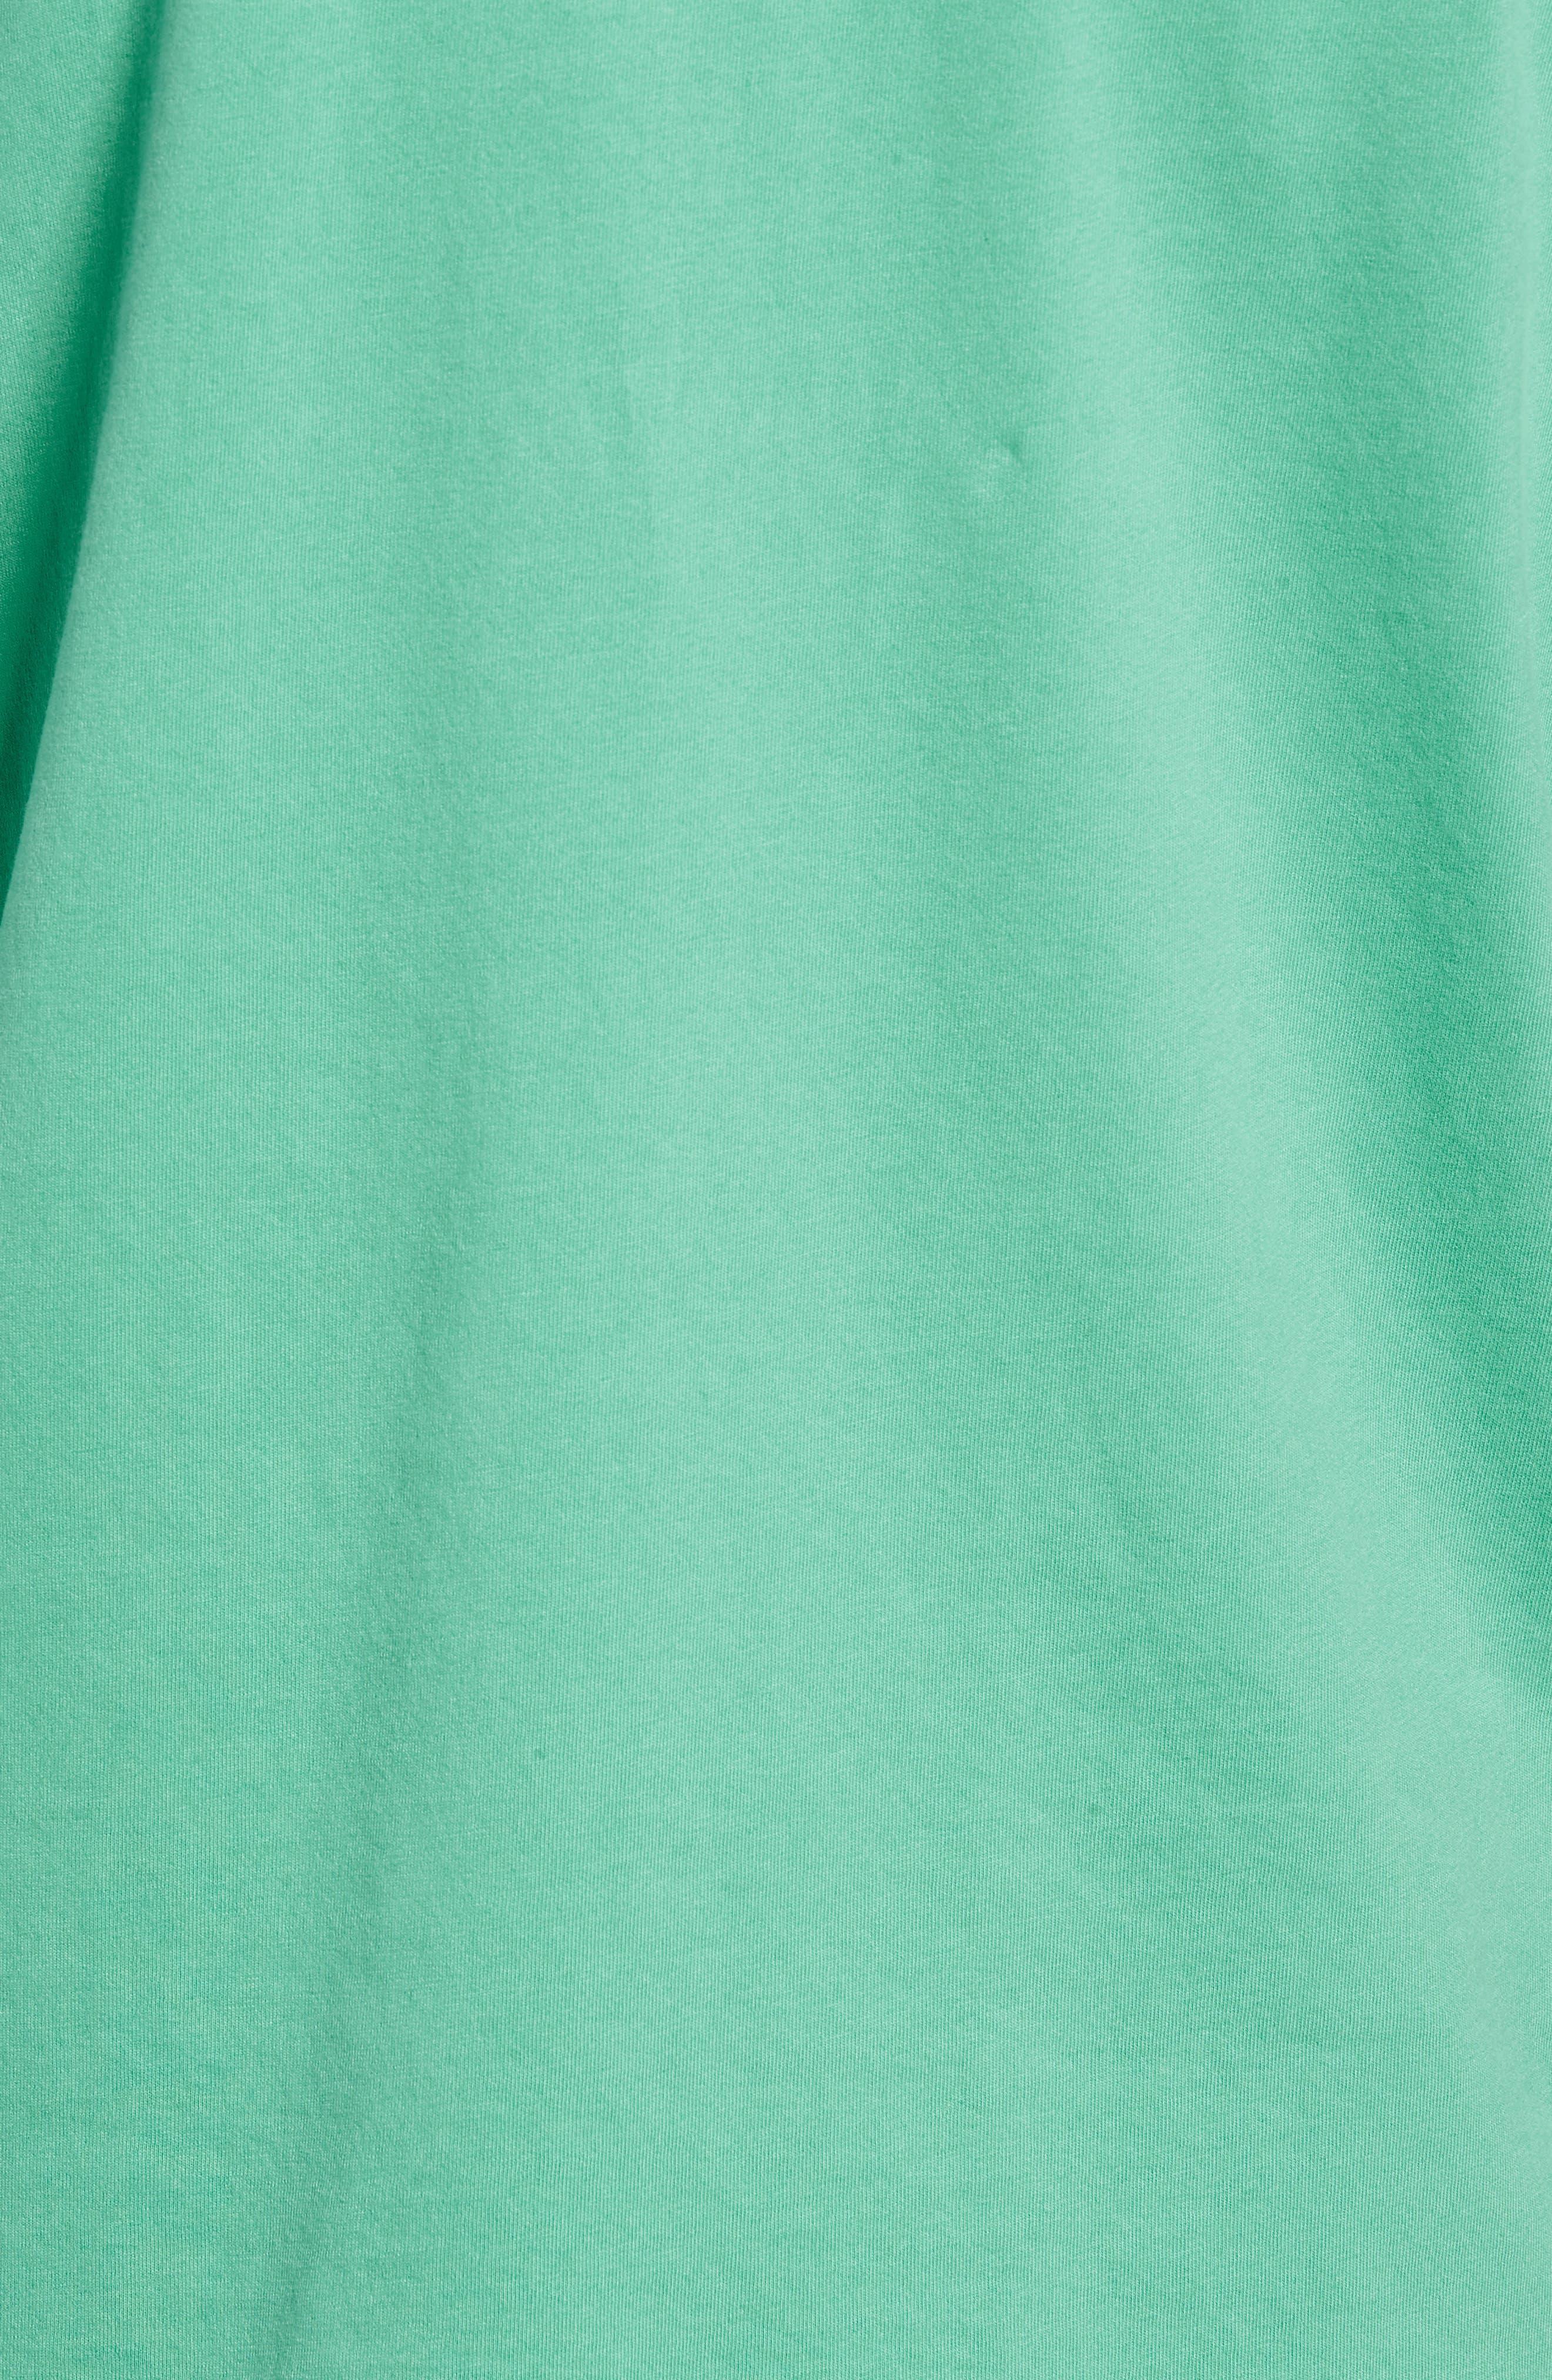 James Pima Long Sleeve Pocket T-Shirt,                             Alternate thumbnail 5, color,                             SEAFOAM GREEN